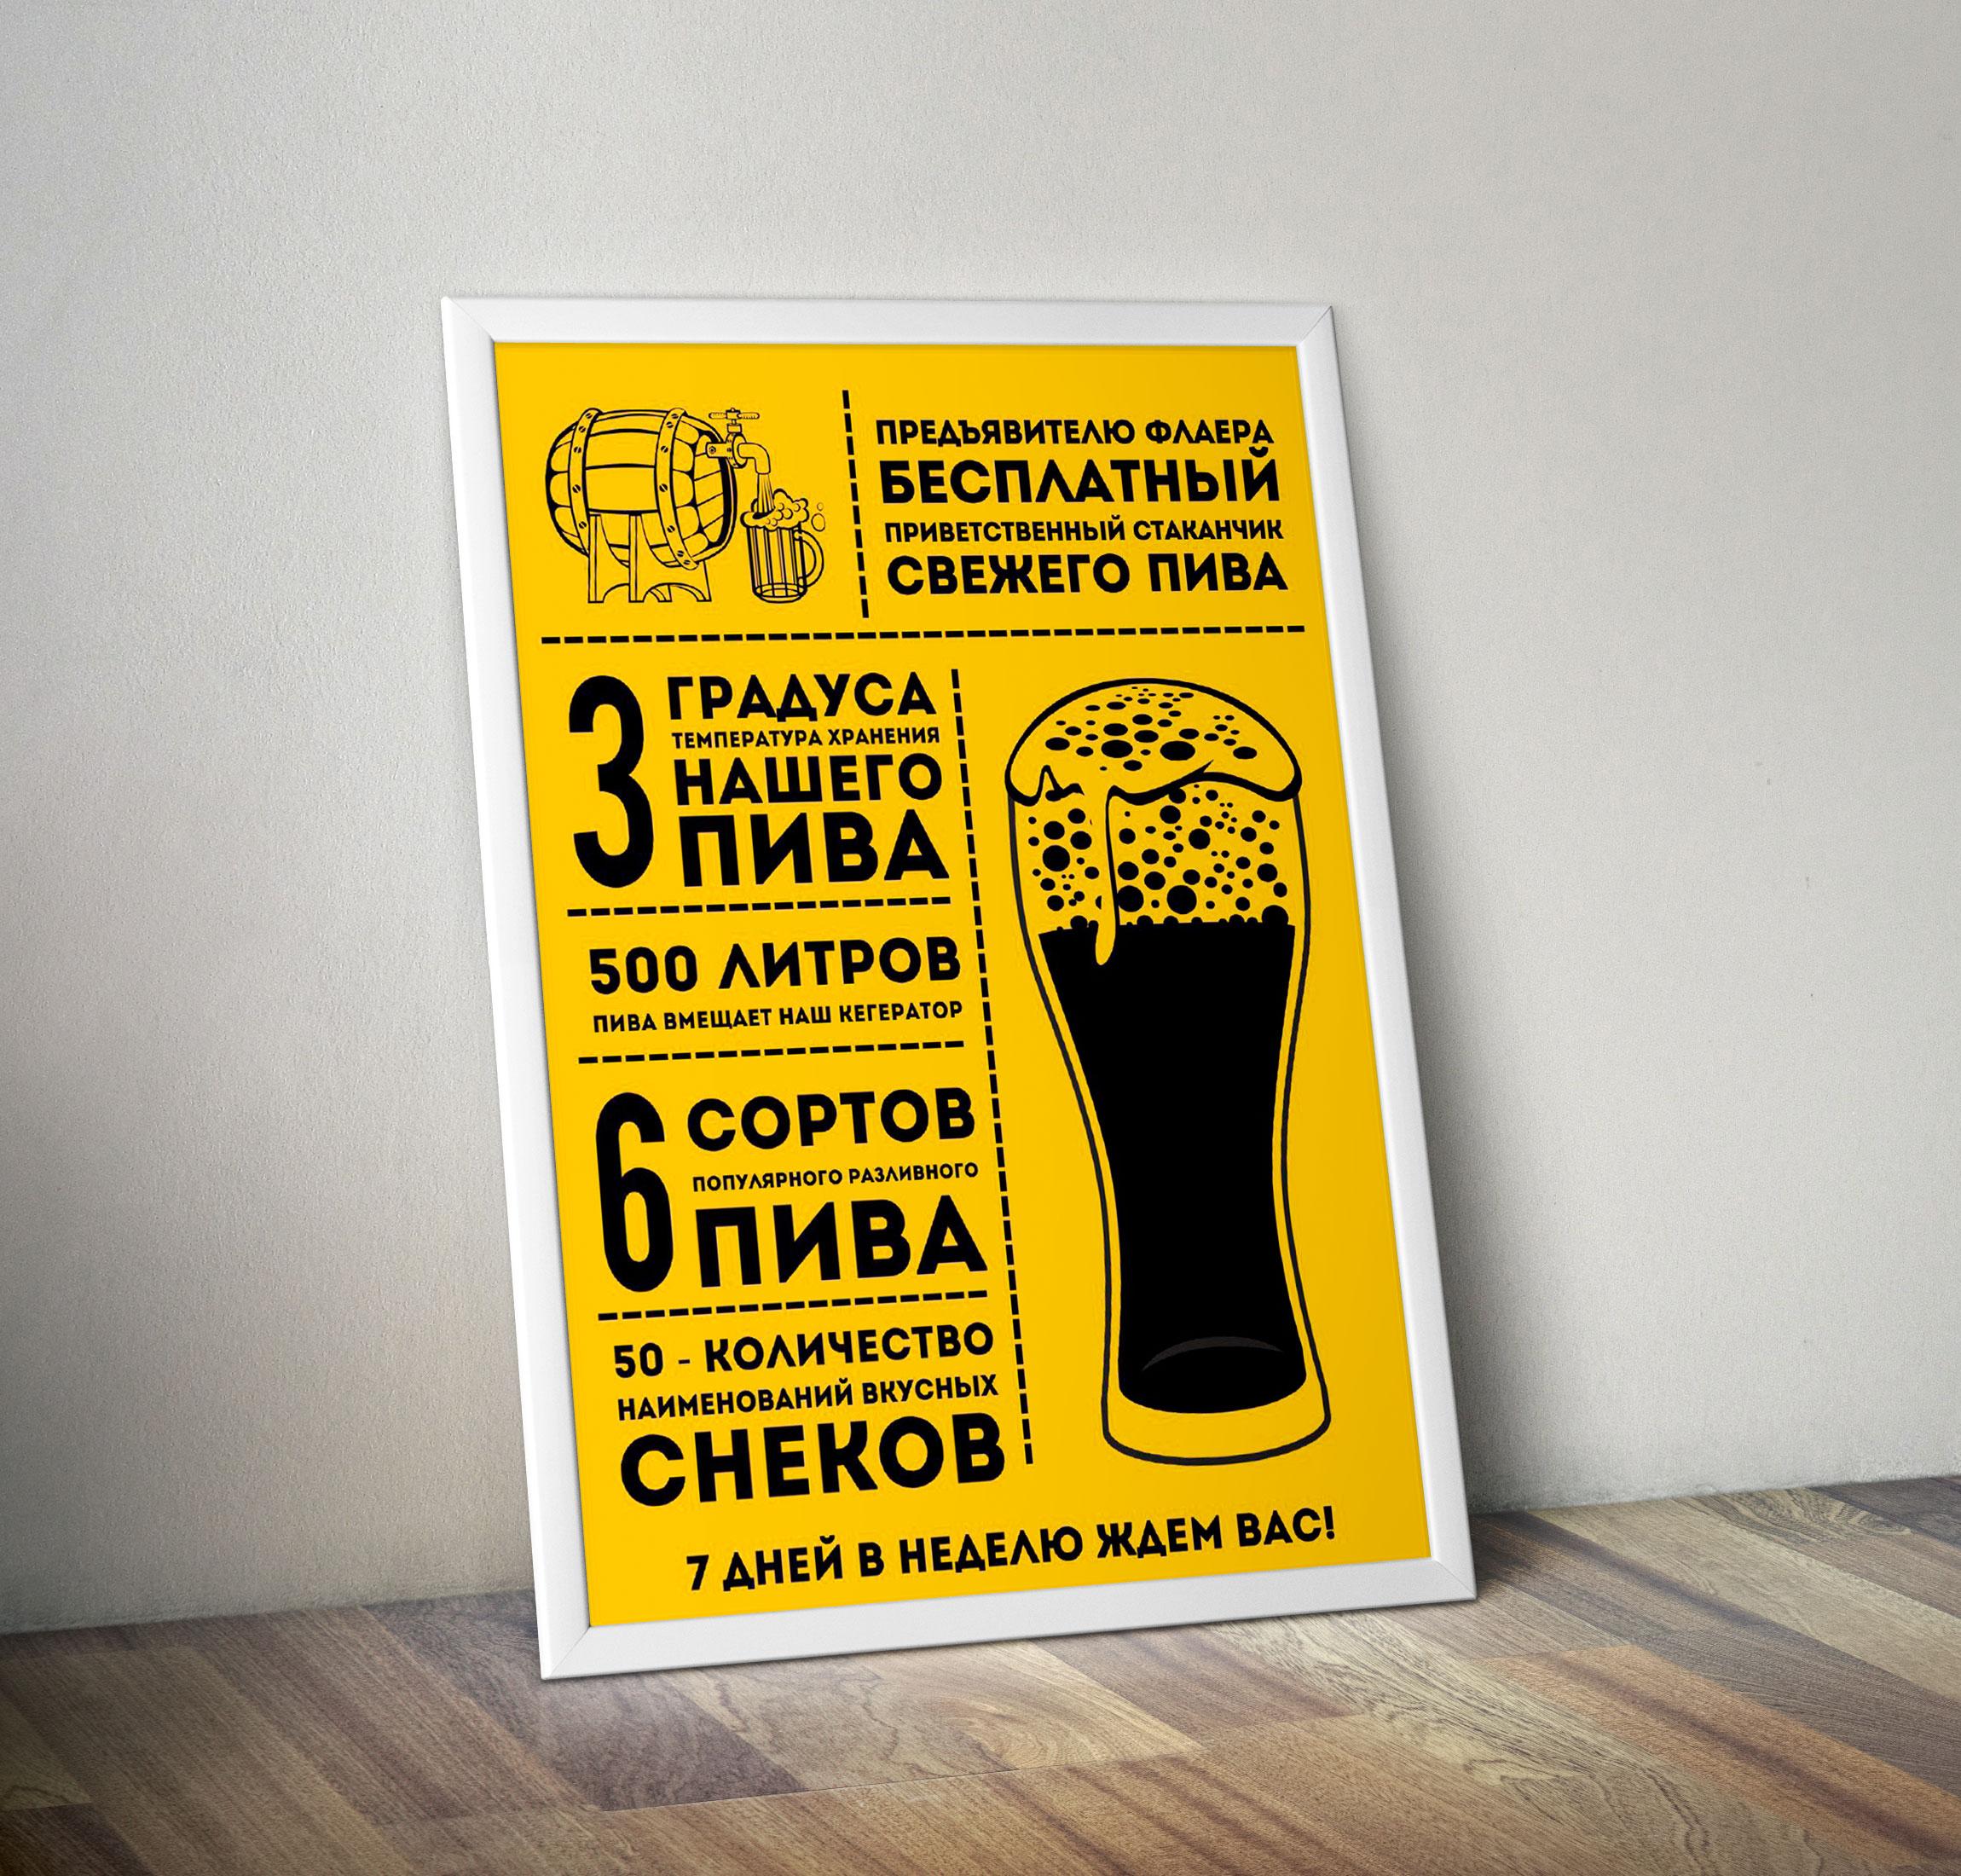 Пивной Маяк // промо-листовка